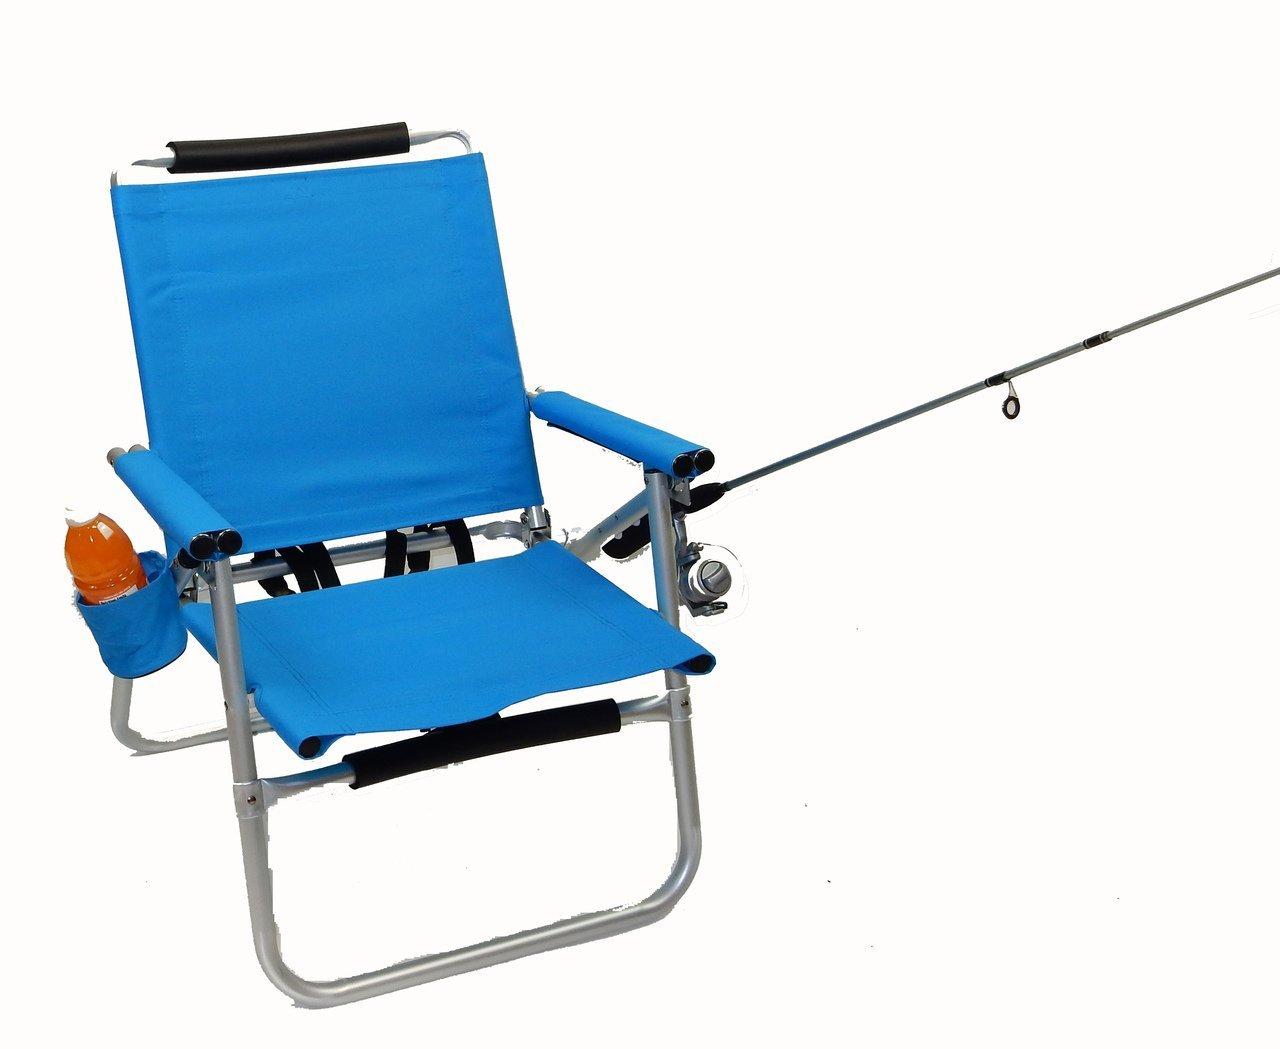 Amazon.com: Oasis Mochila Silla de pesca: Sports & Outdoors